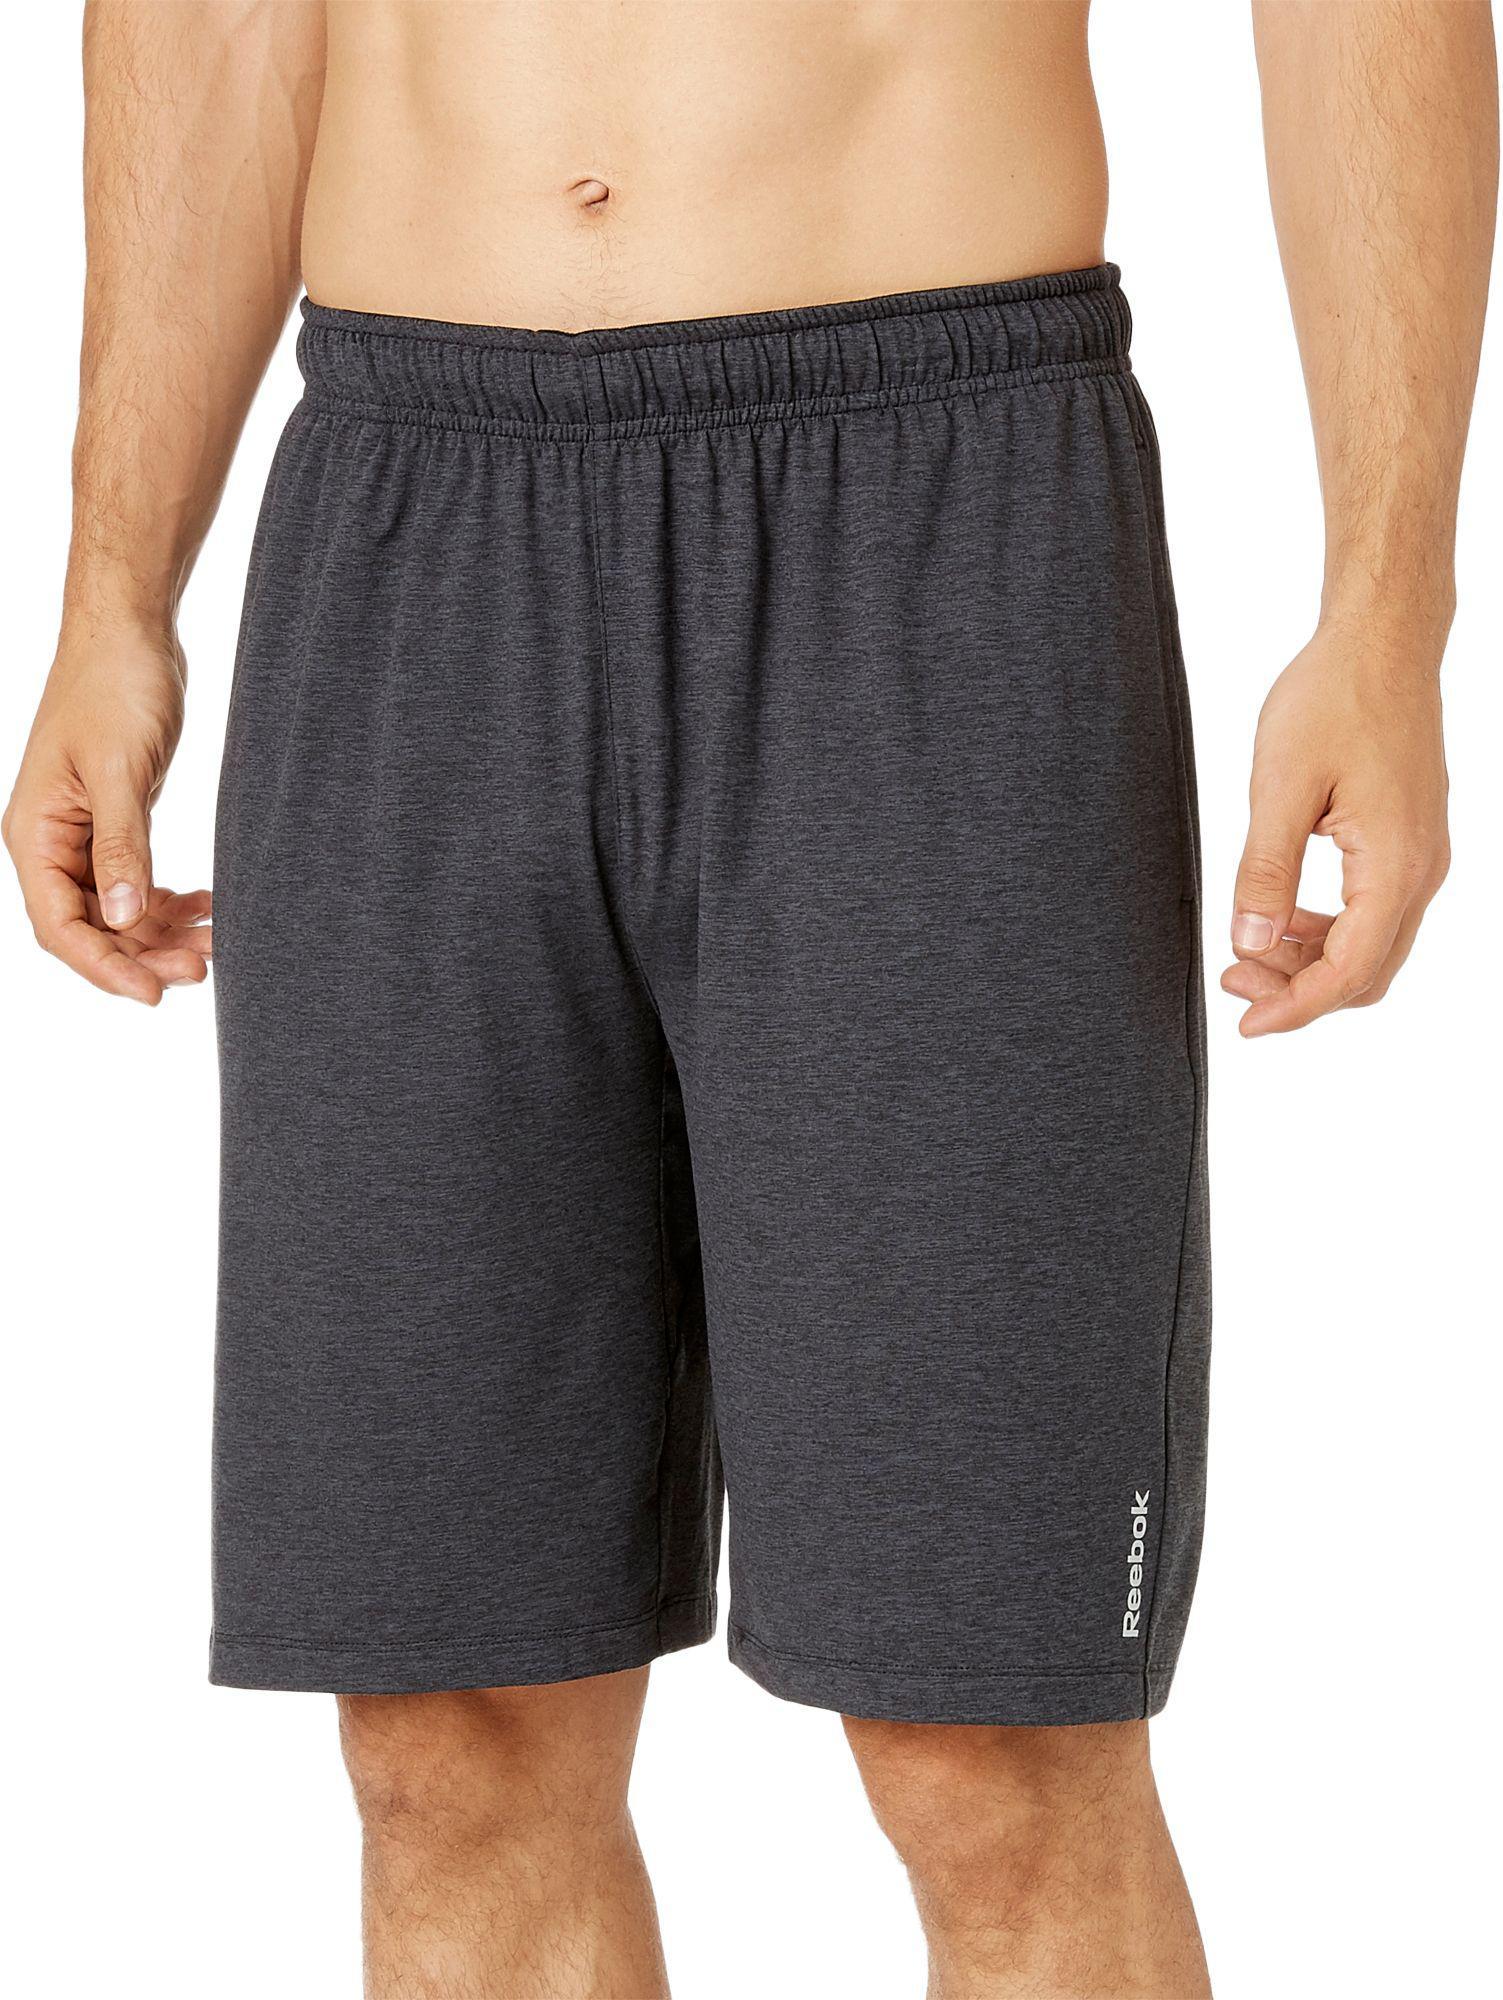 Reebok Black Polyester Shorts - Buy Reebok Black Polyester